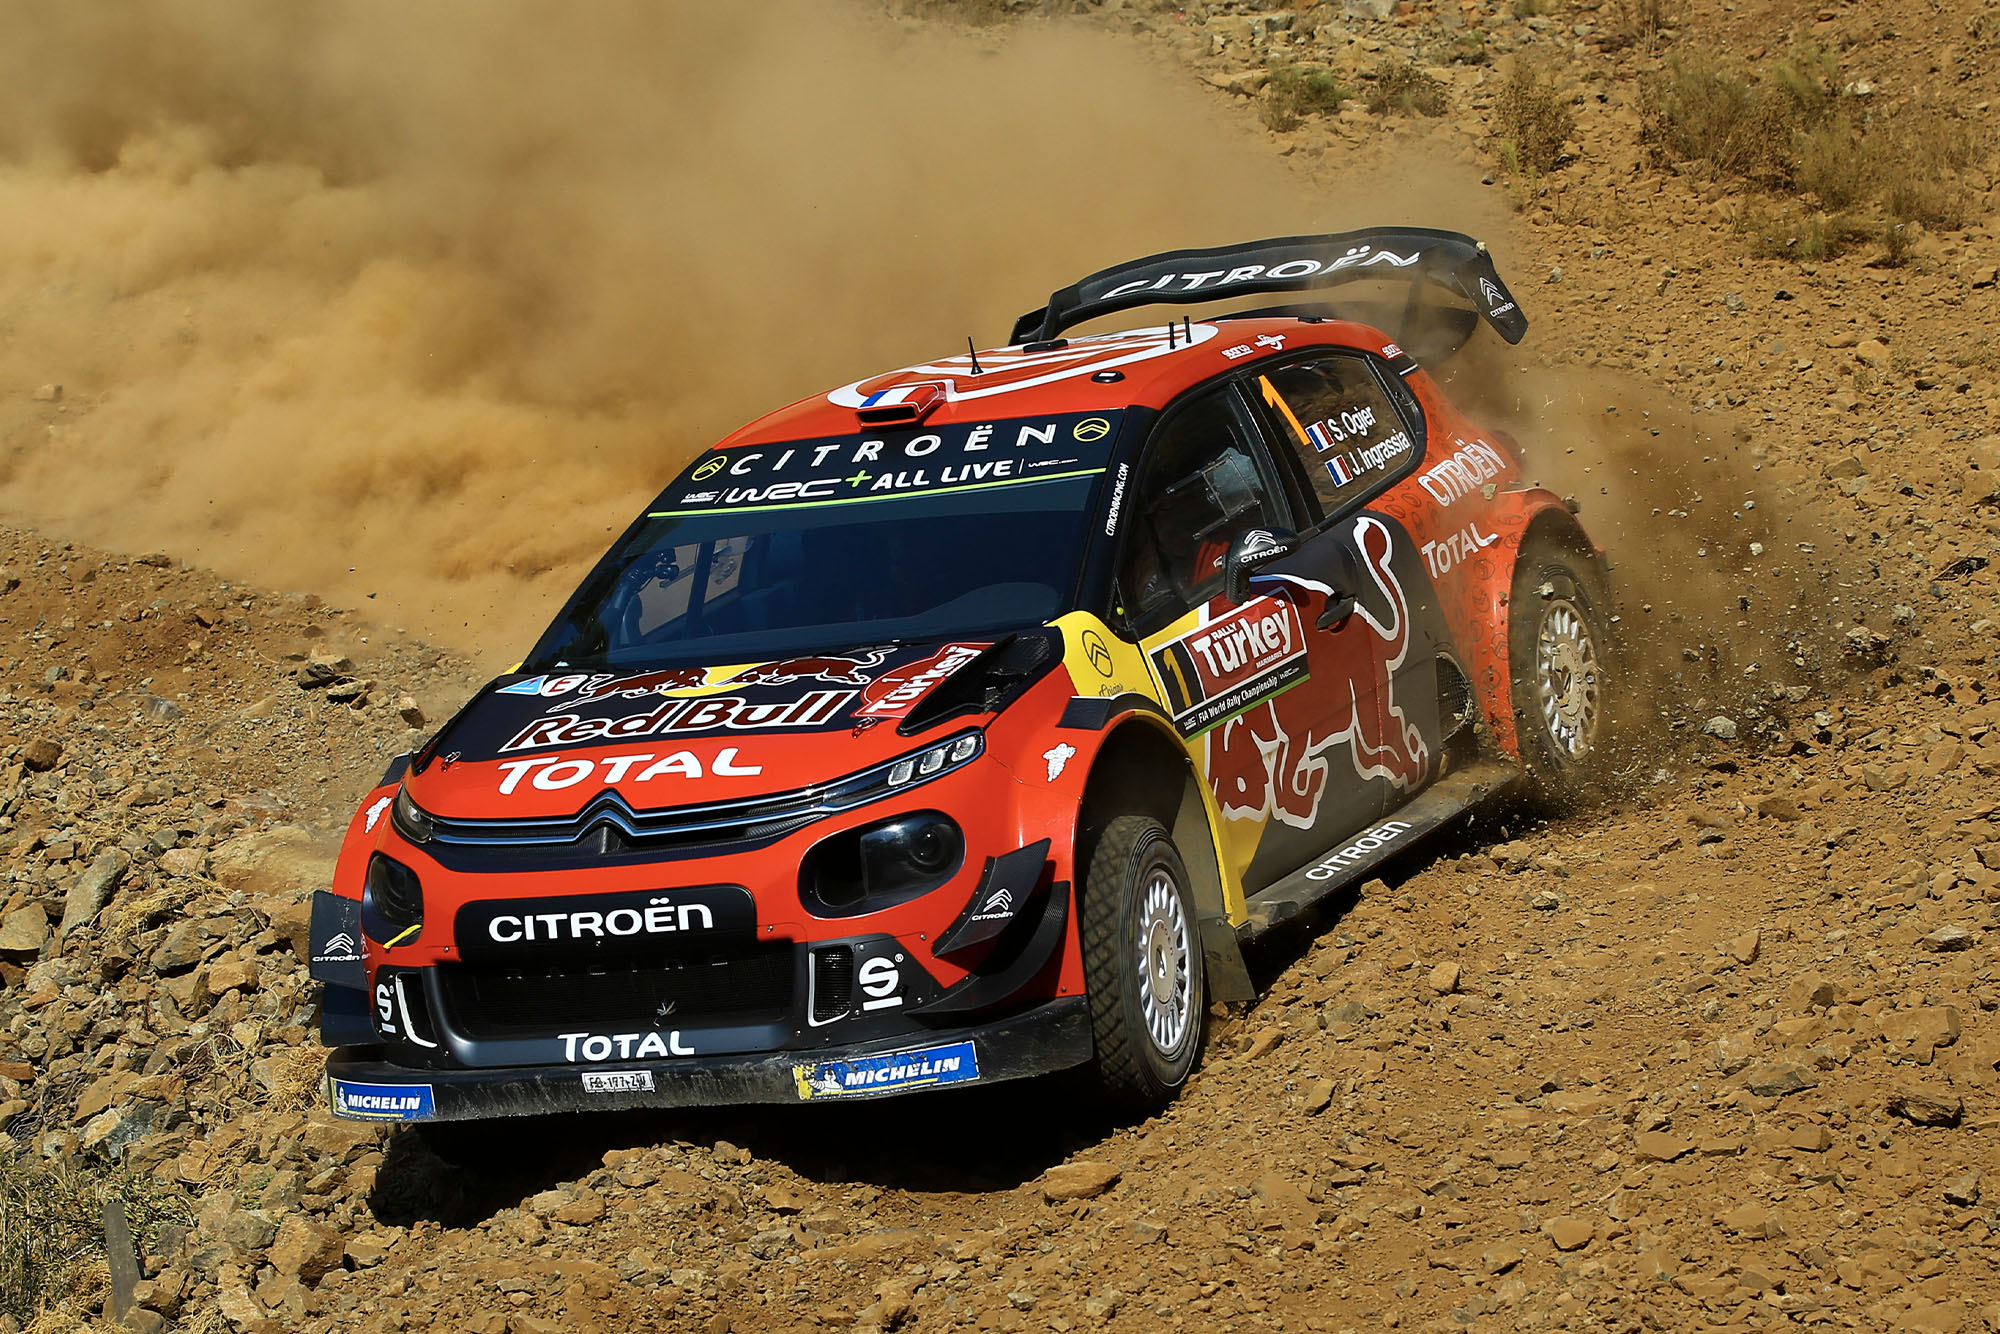 Citroen Racing World Rally Team